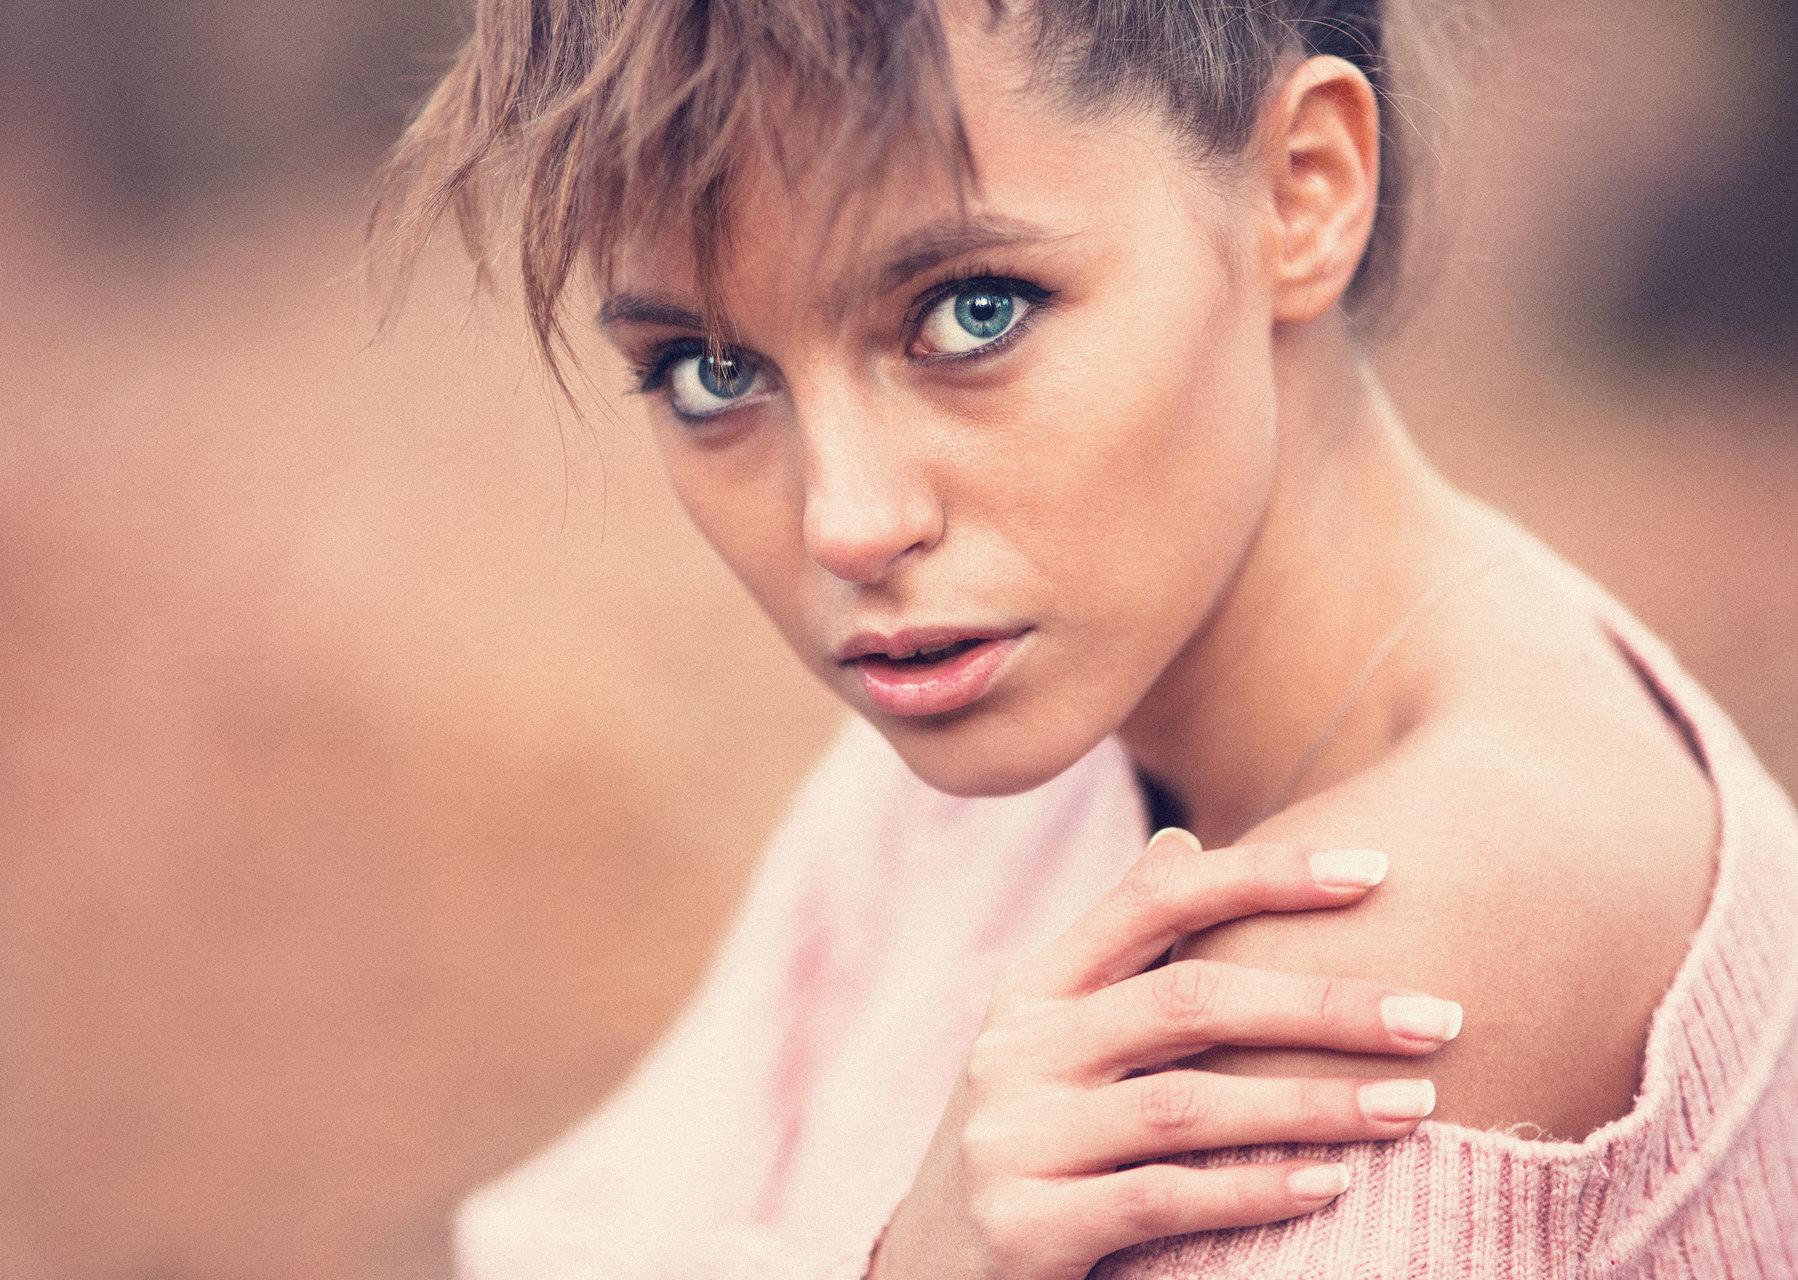 Photo in Portrait | Author dimovanton | PHOTO FORUM